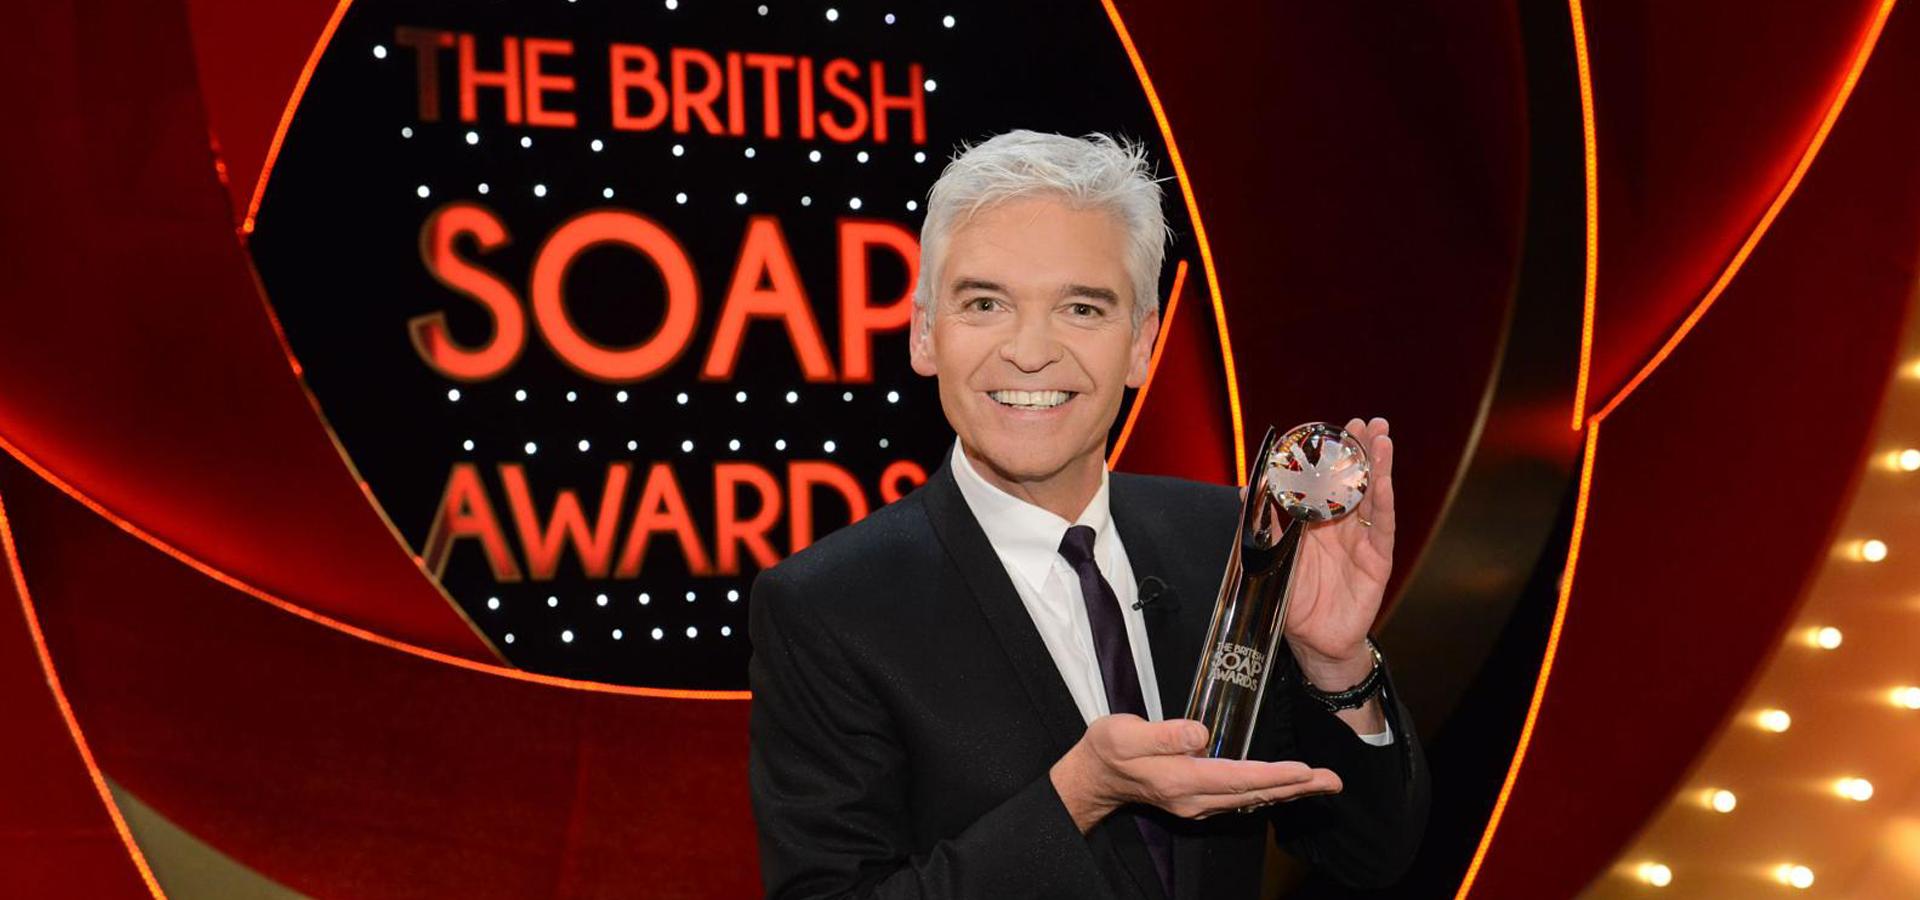 Soap Awards.png